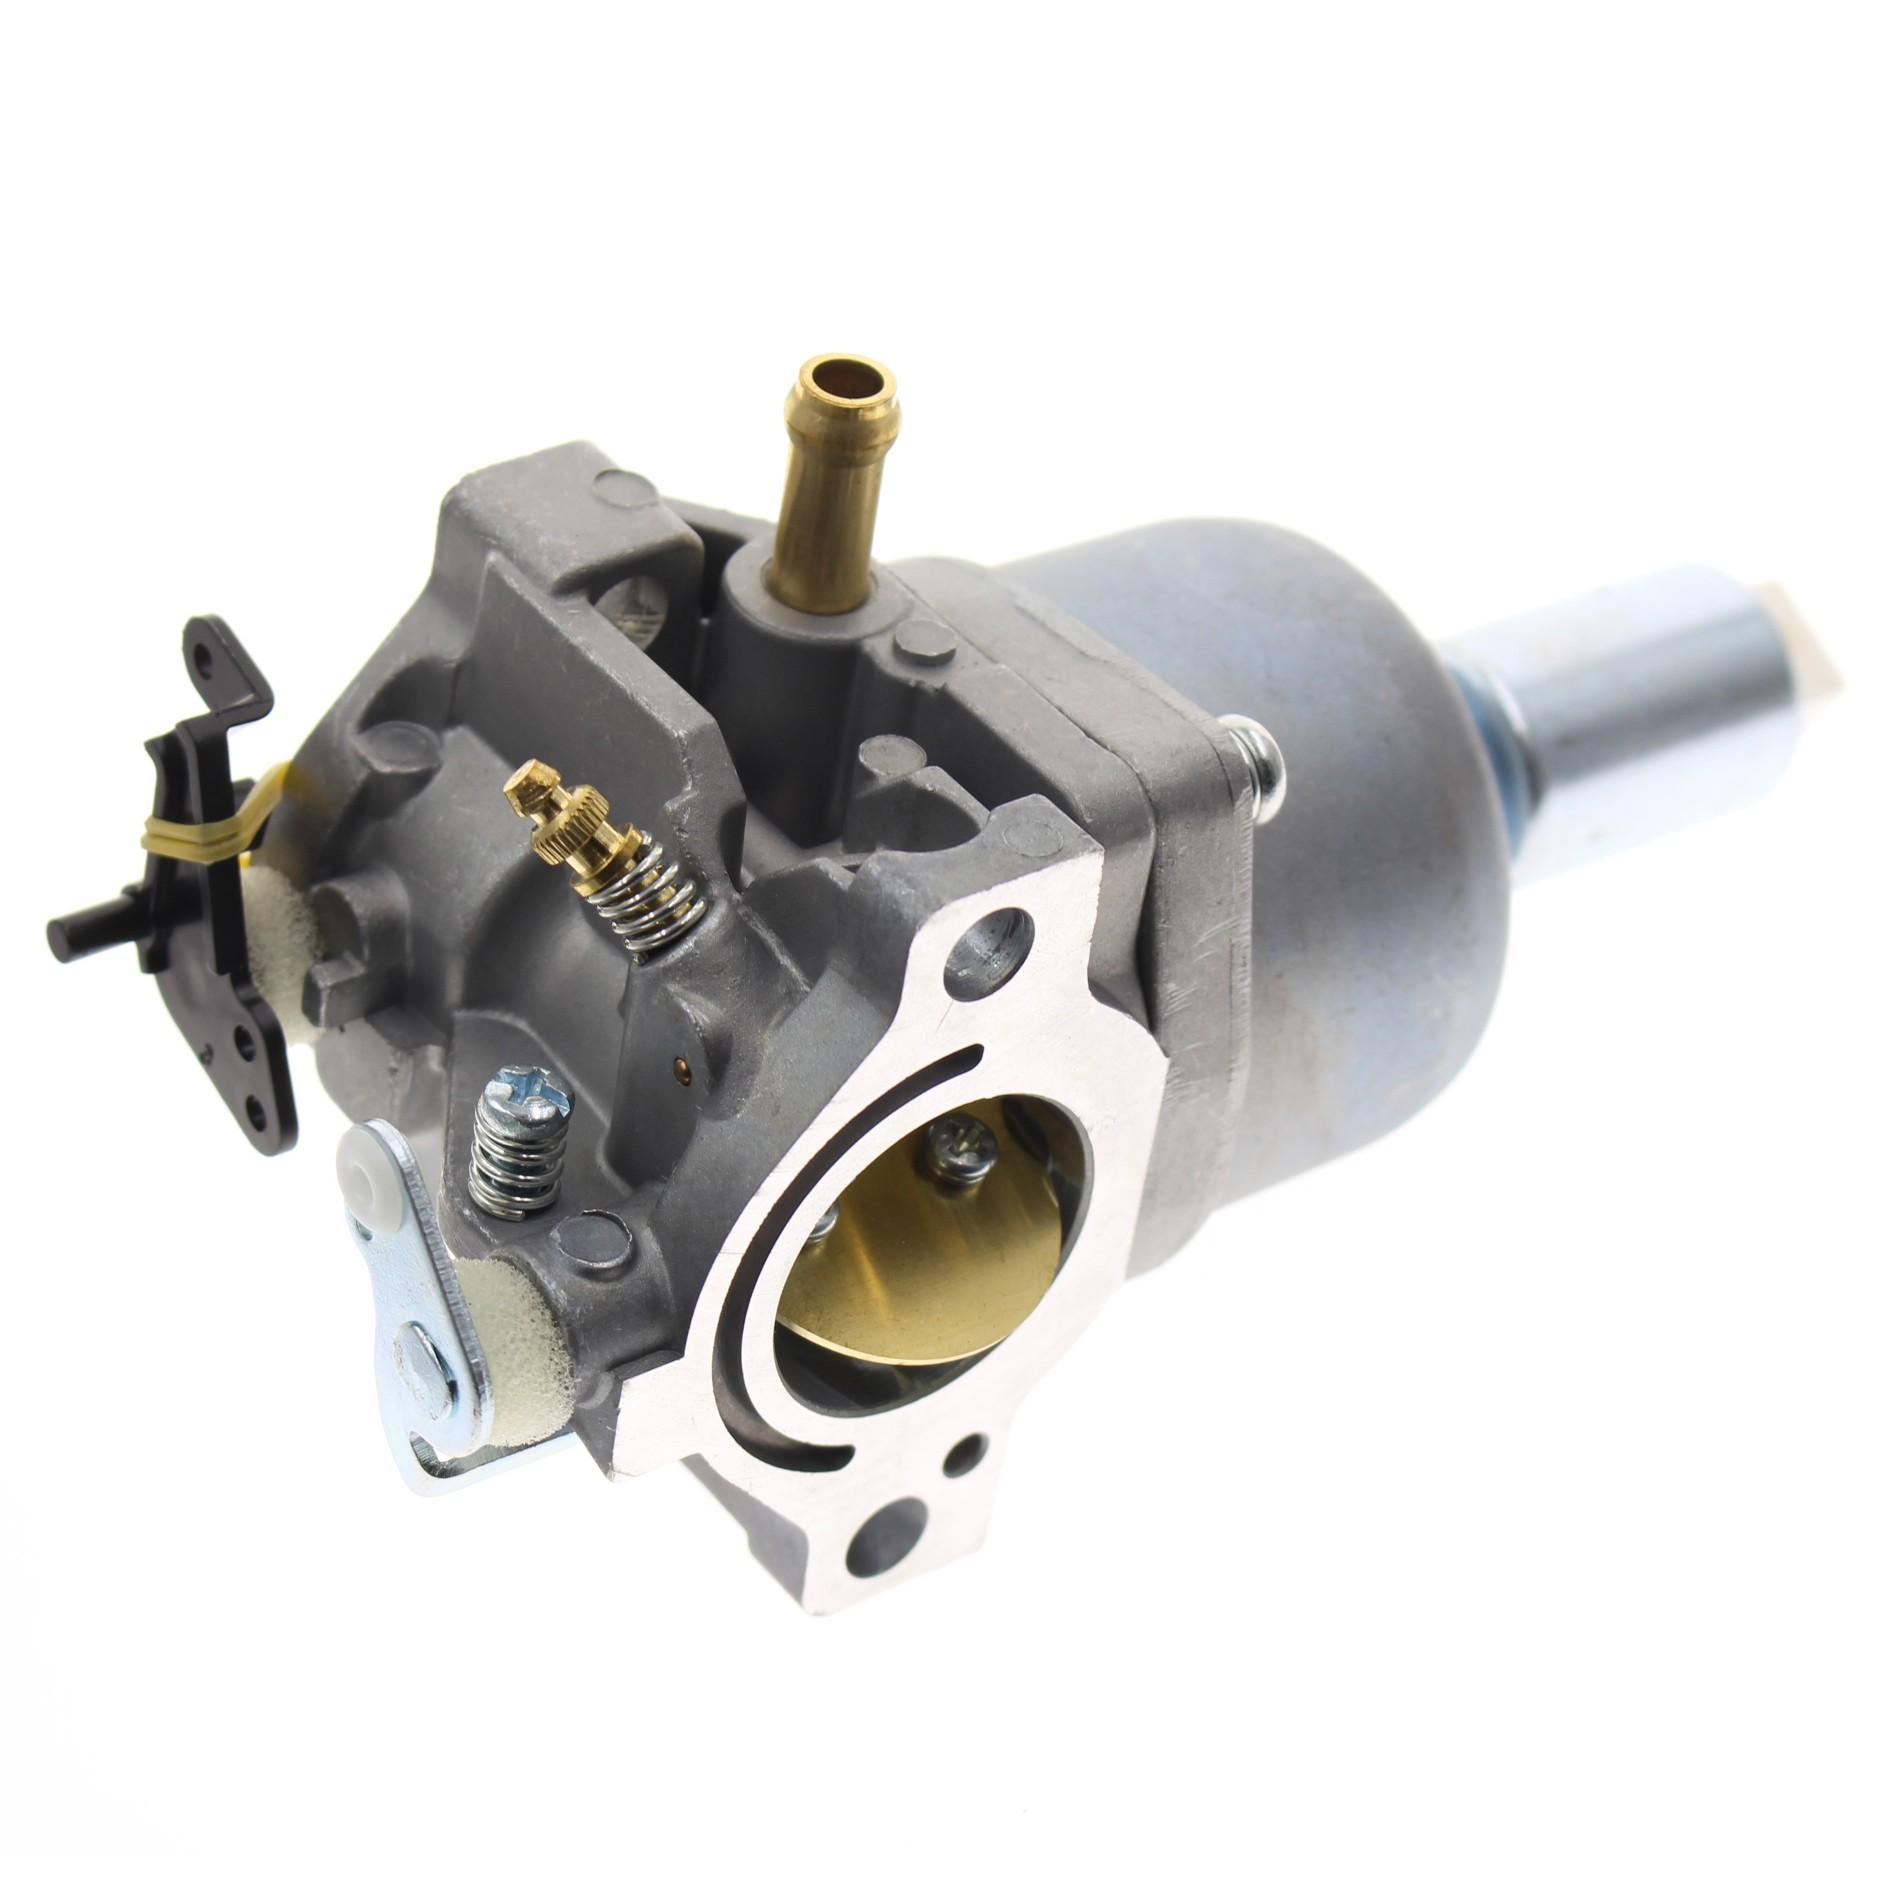 Parts for 17.5 Briggs Stratton Engine Carburetor Set for Briggs & Straton 17 5hp & 14 5hp I C & 14hp 18hp Intek Of Parts for 17.5 Briggs Stratton Engine